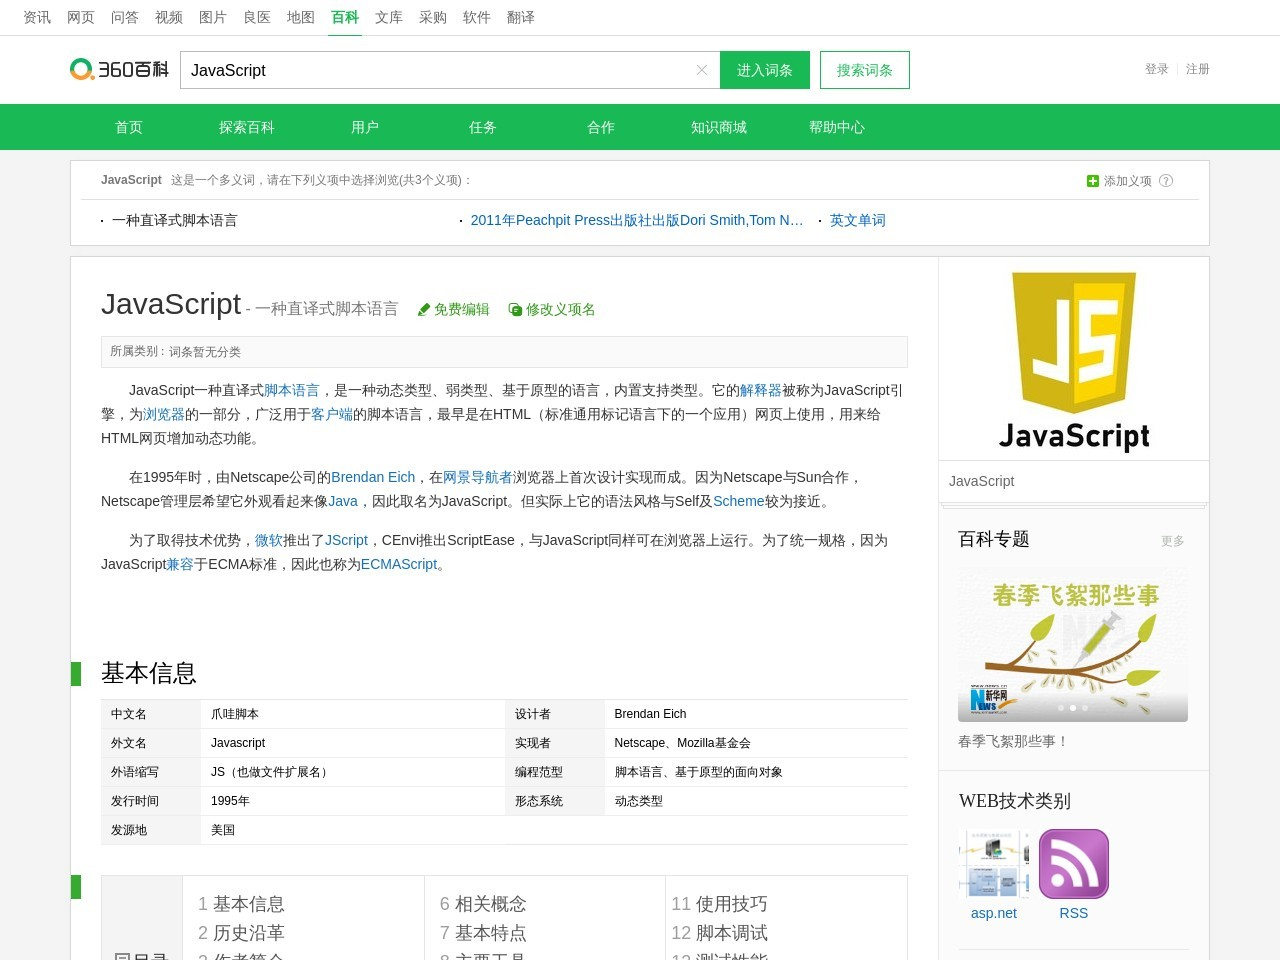 JavaScript_360百科